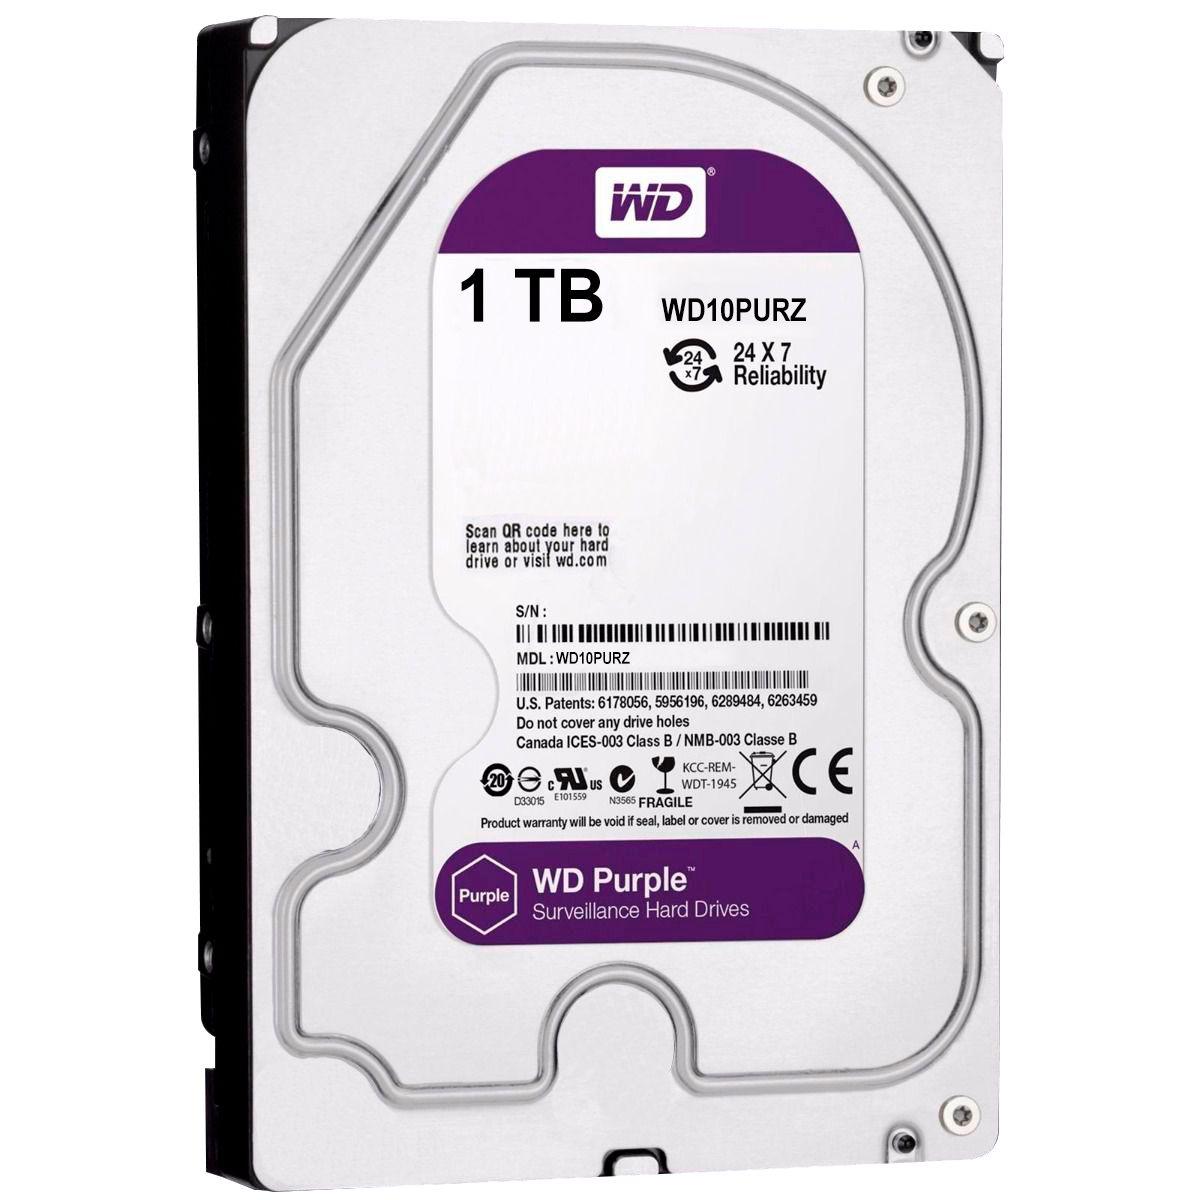 Kit Intelbras 10 Câmeras HD 720p VMH 3130 B + DVR Intelbras + HD 1TB WD Purple + Acessórios  - Tudo Forte